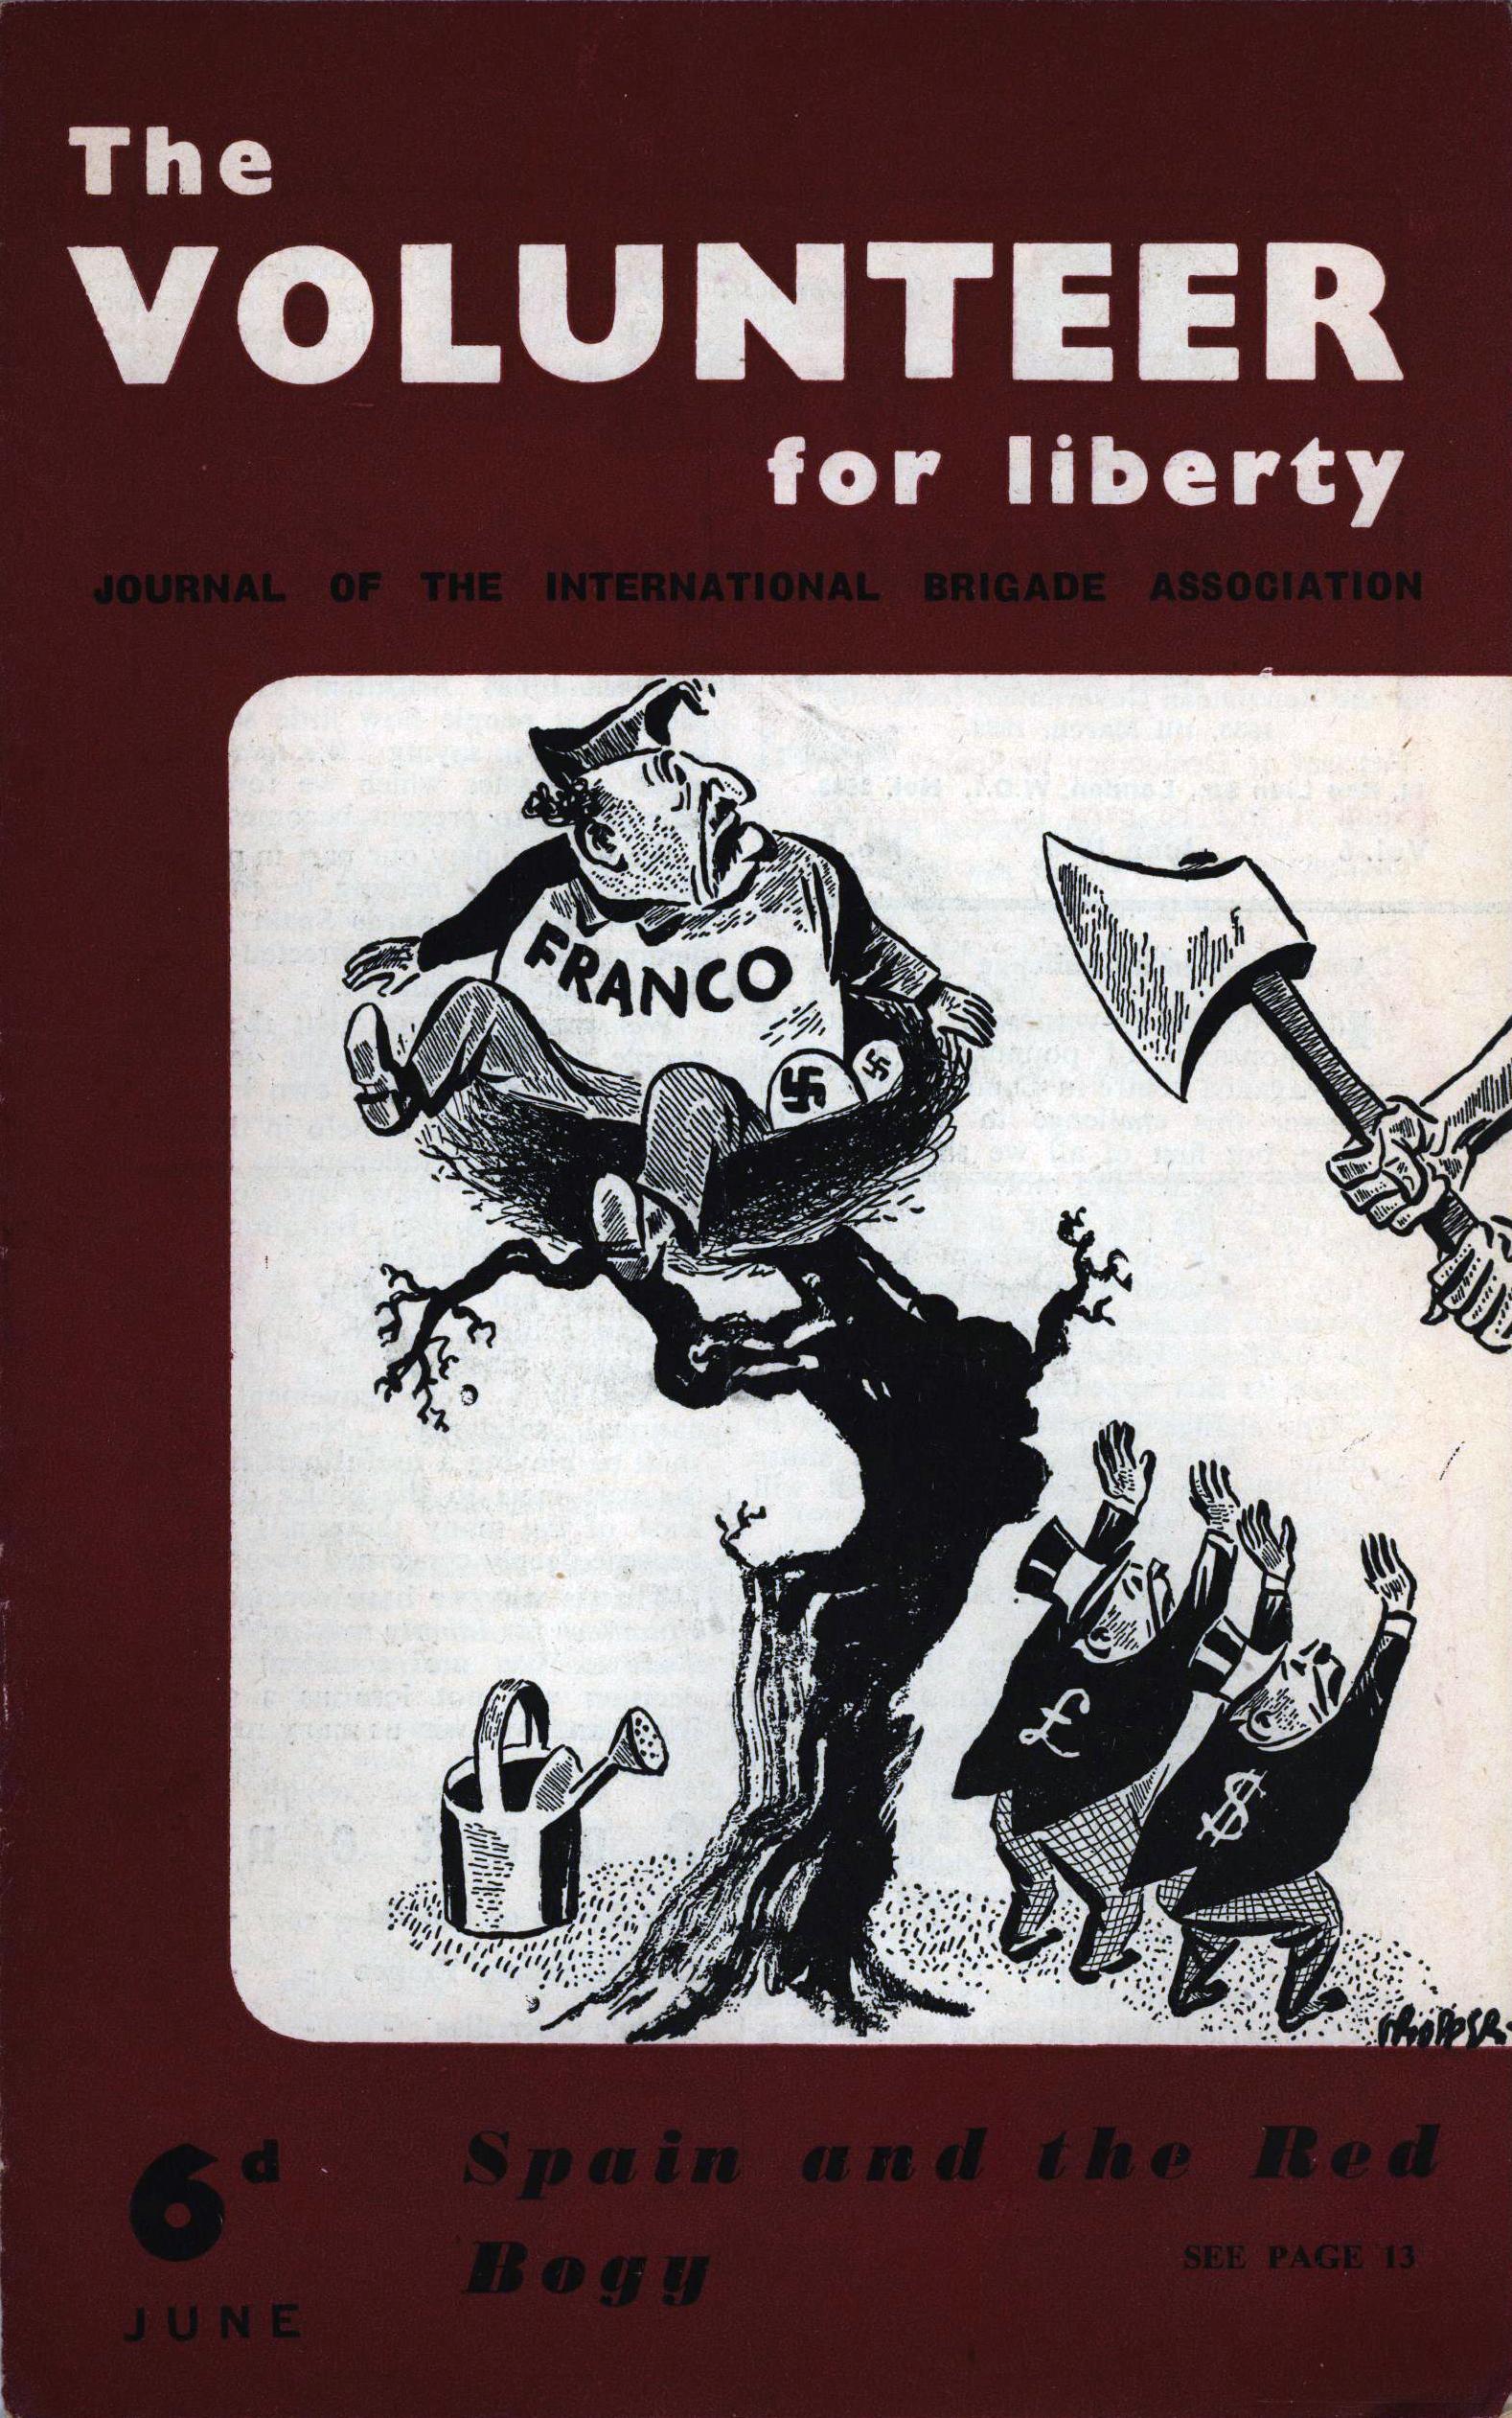 The Volunteer for Liberty 6d June 1946